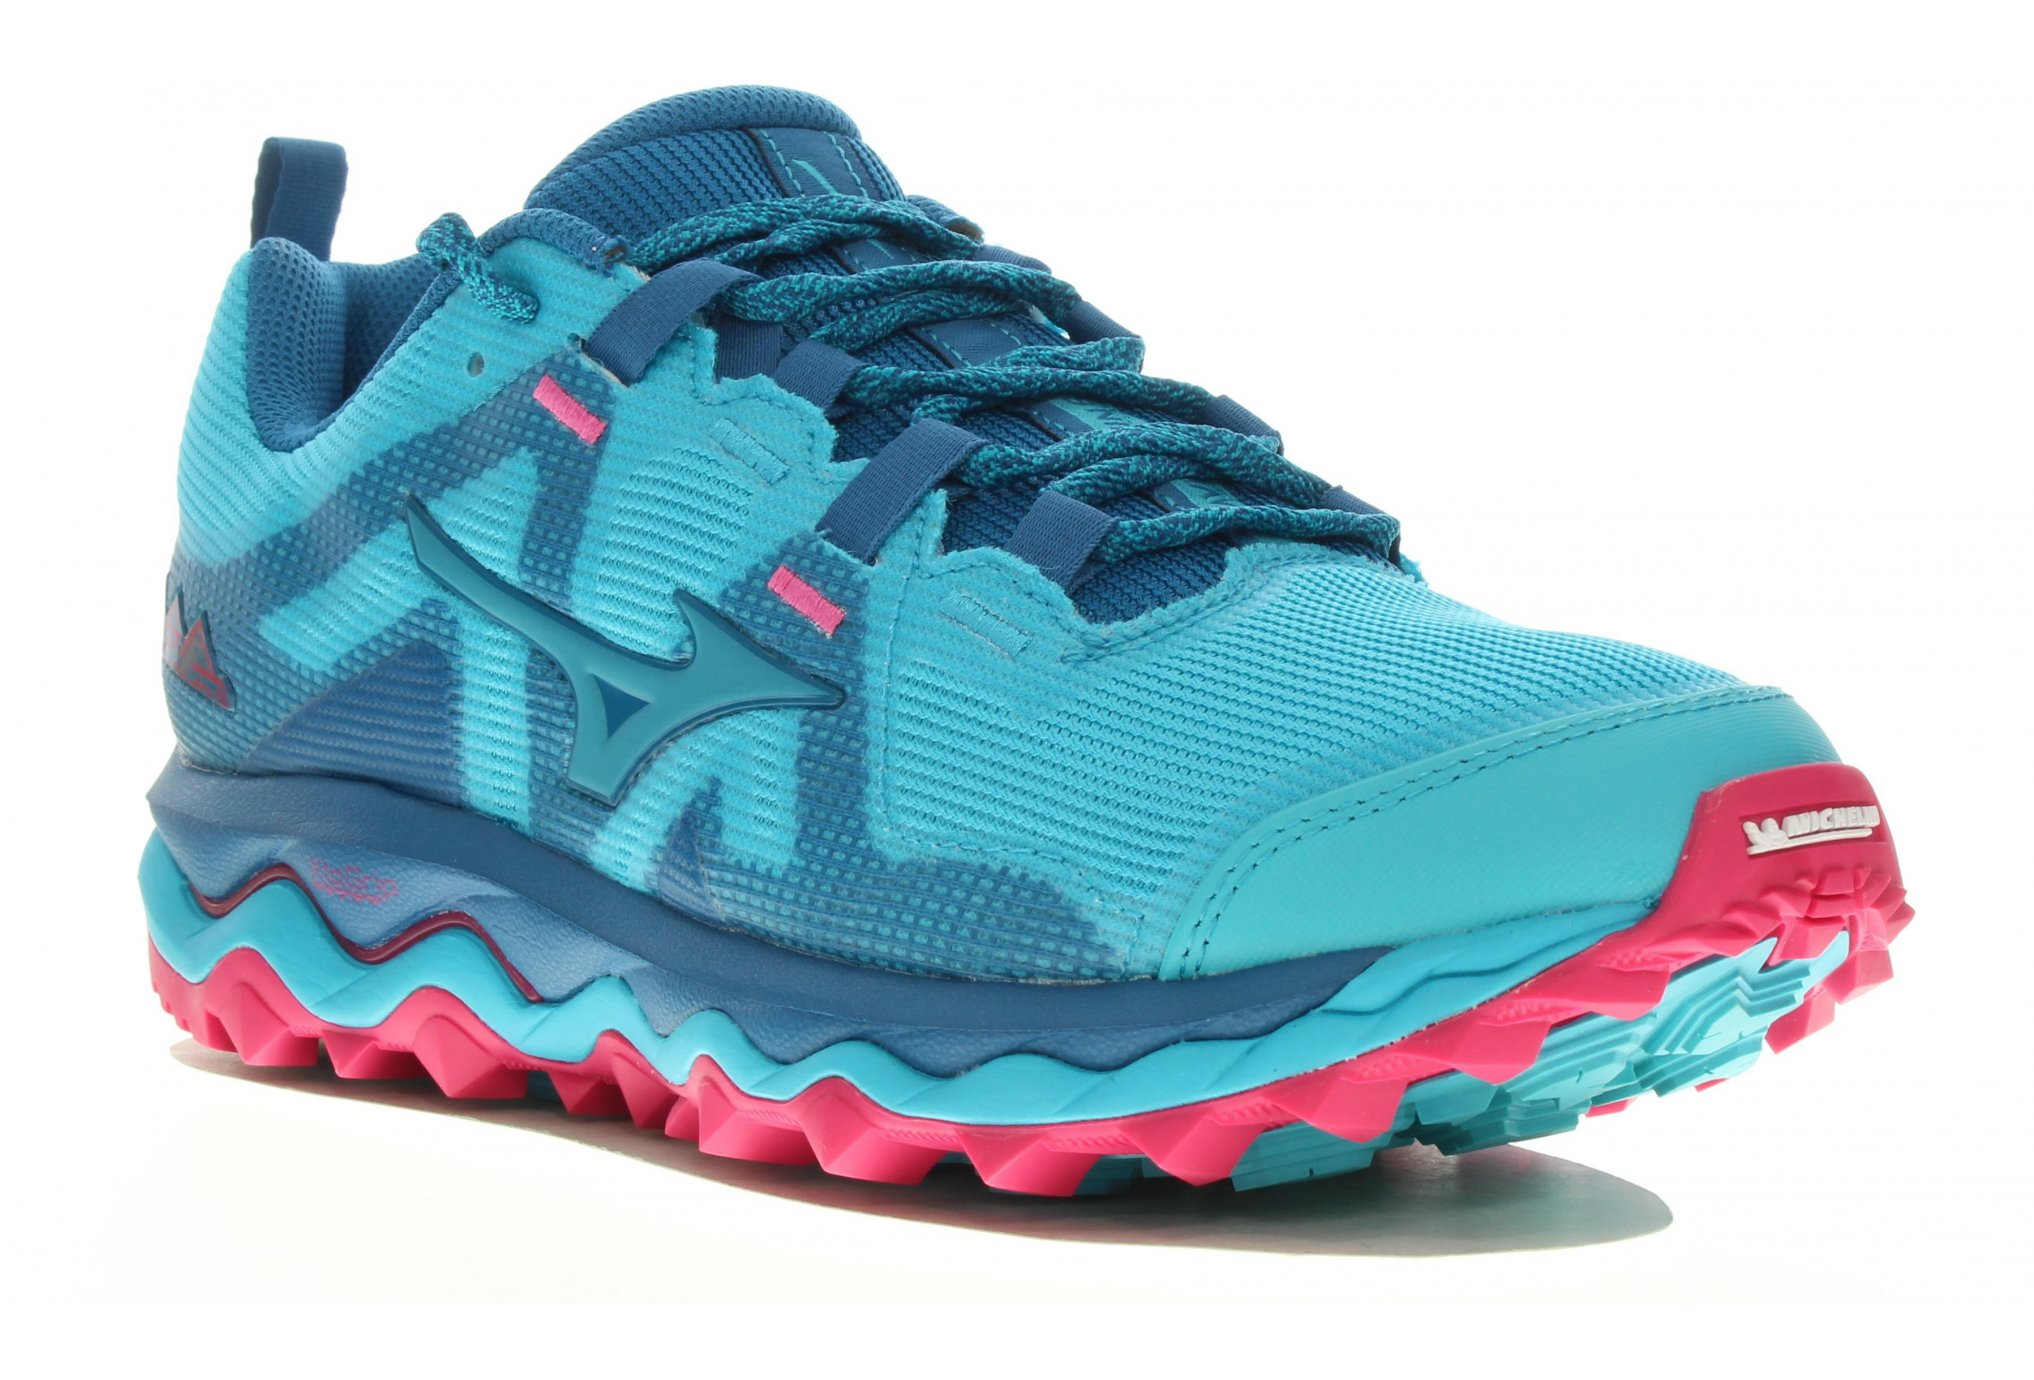 Mizuno Wave Mujin 6 Chaussures running femme